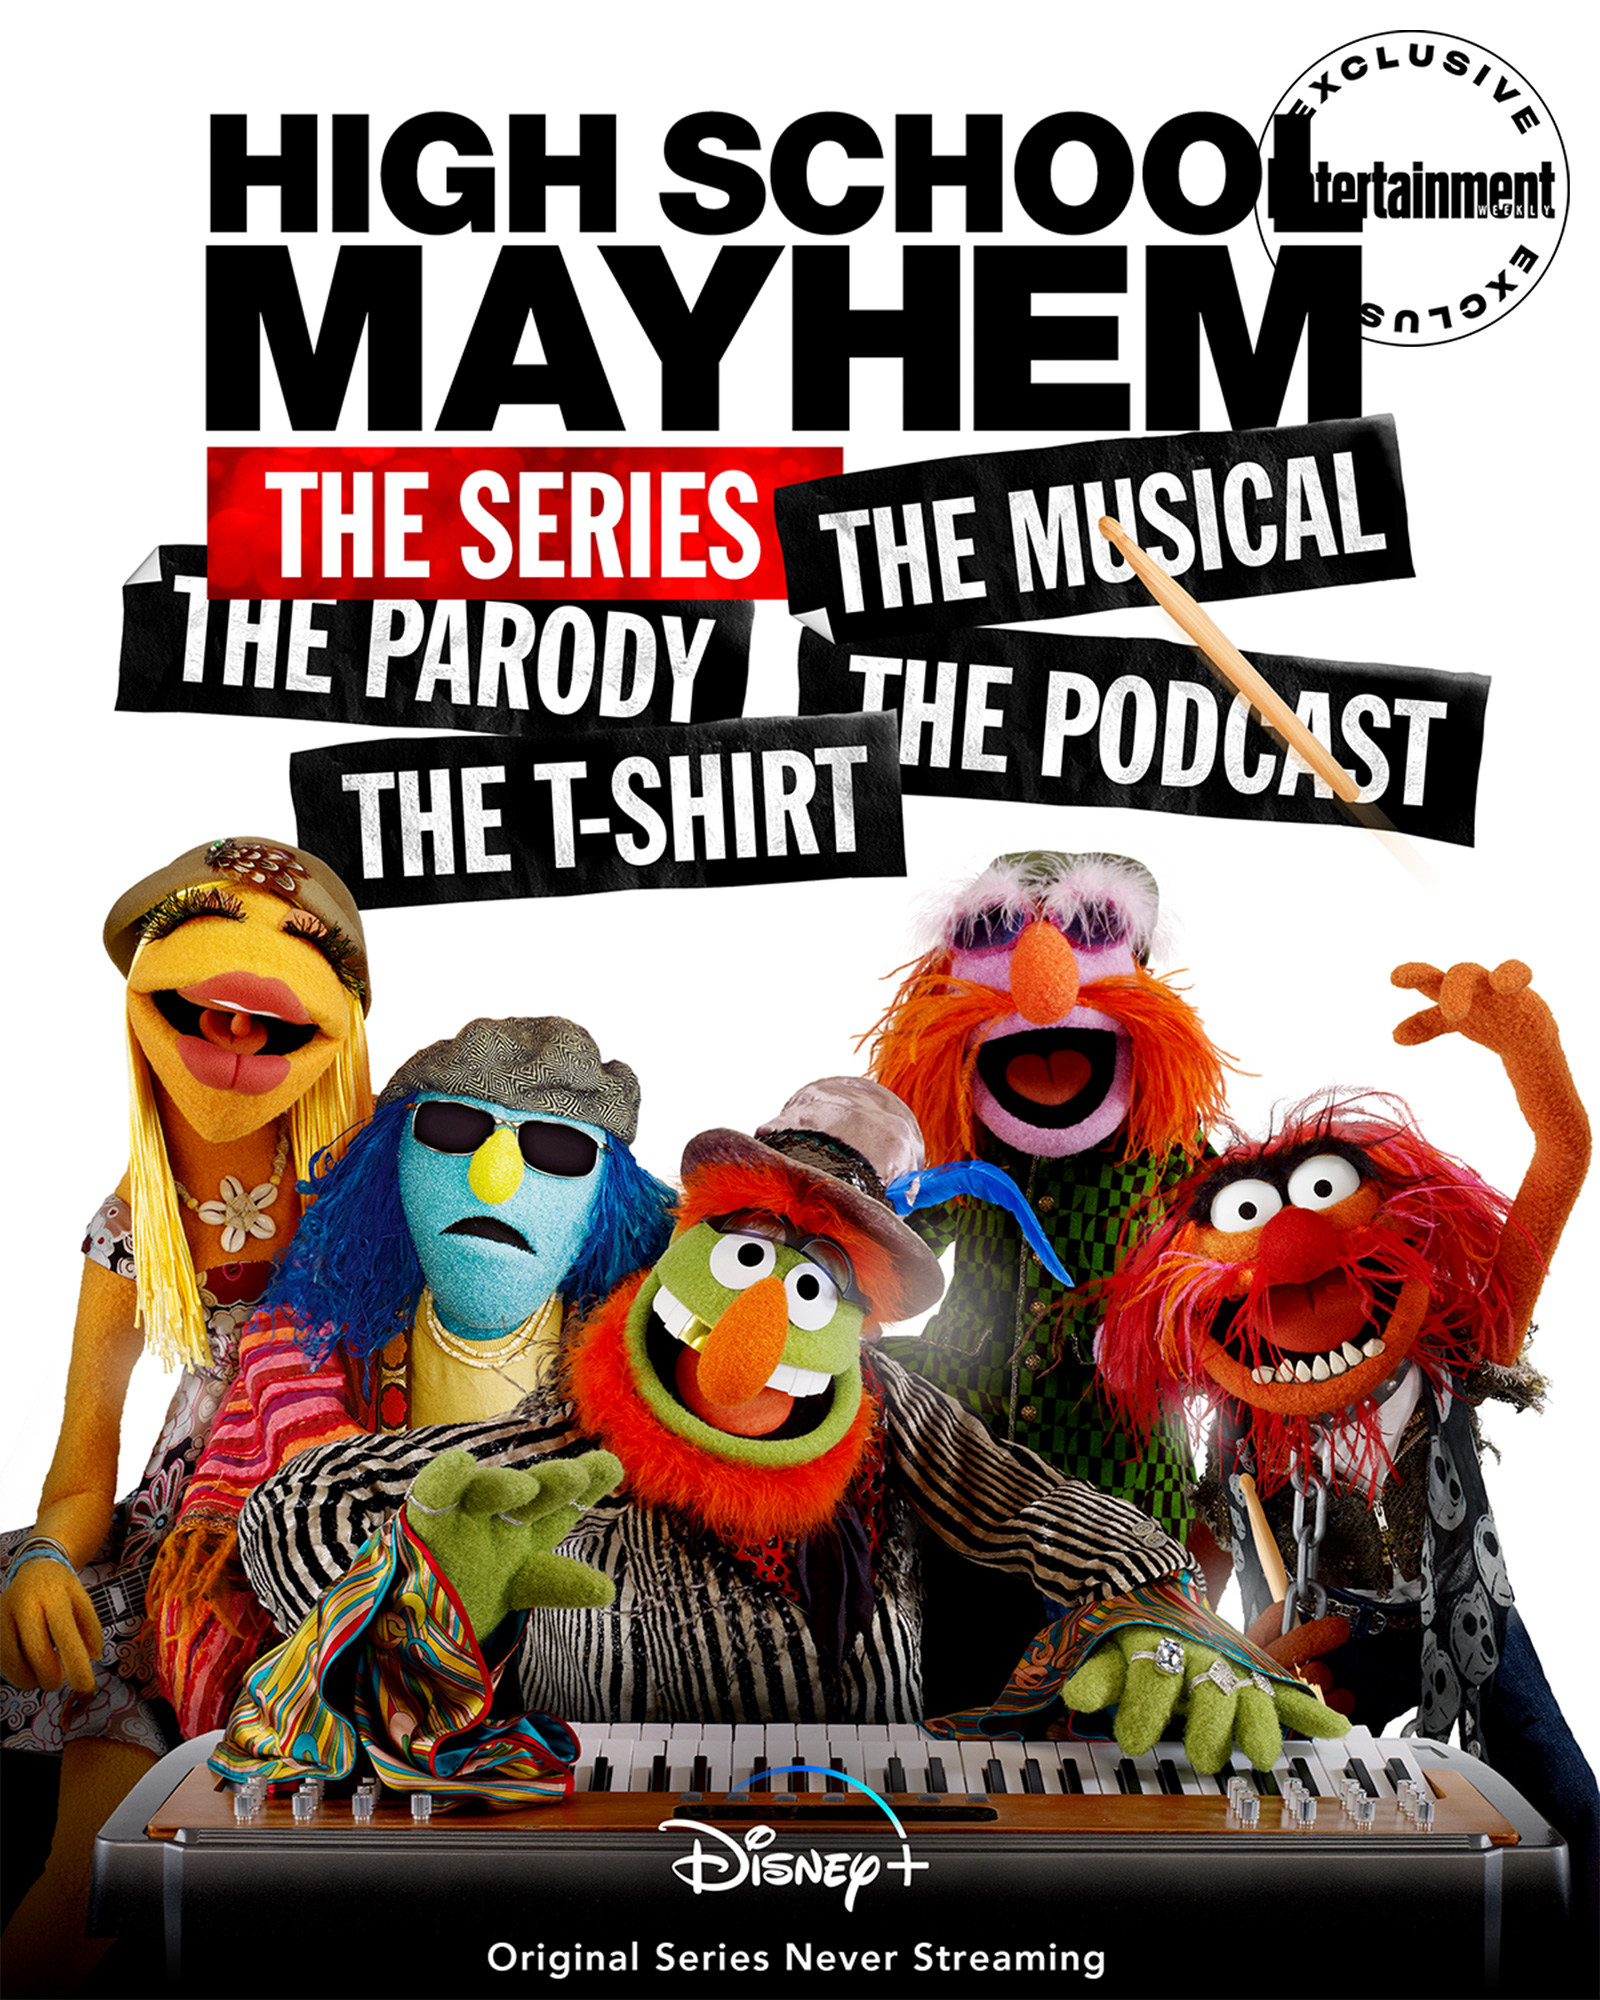 Muppets new